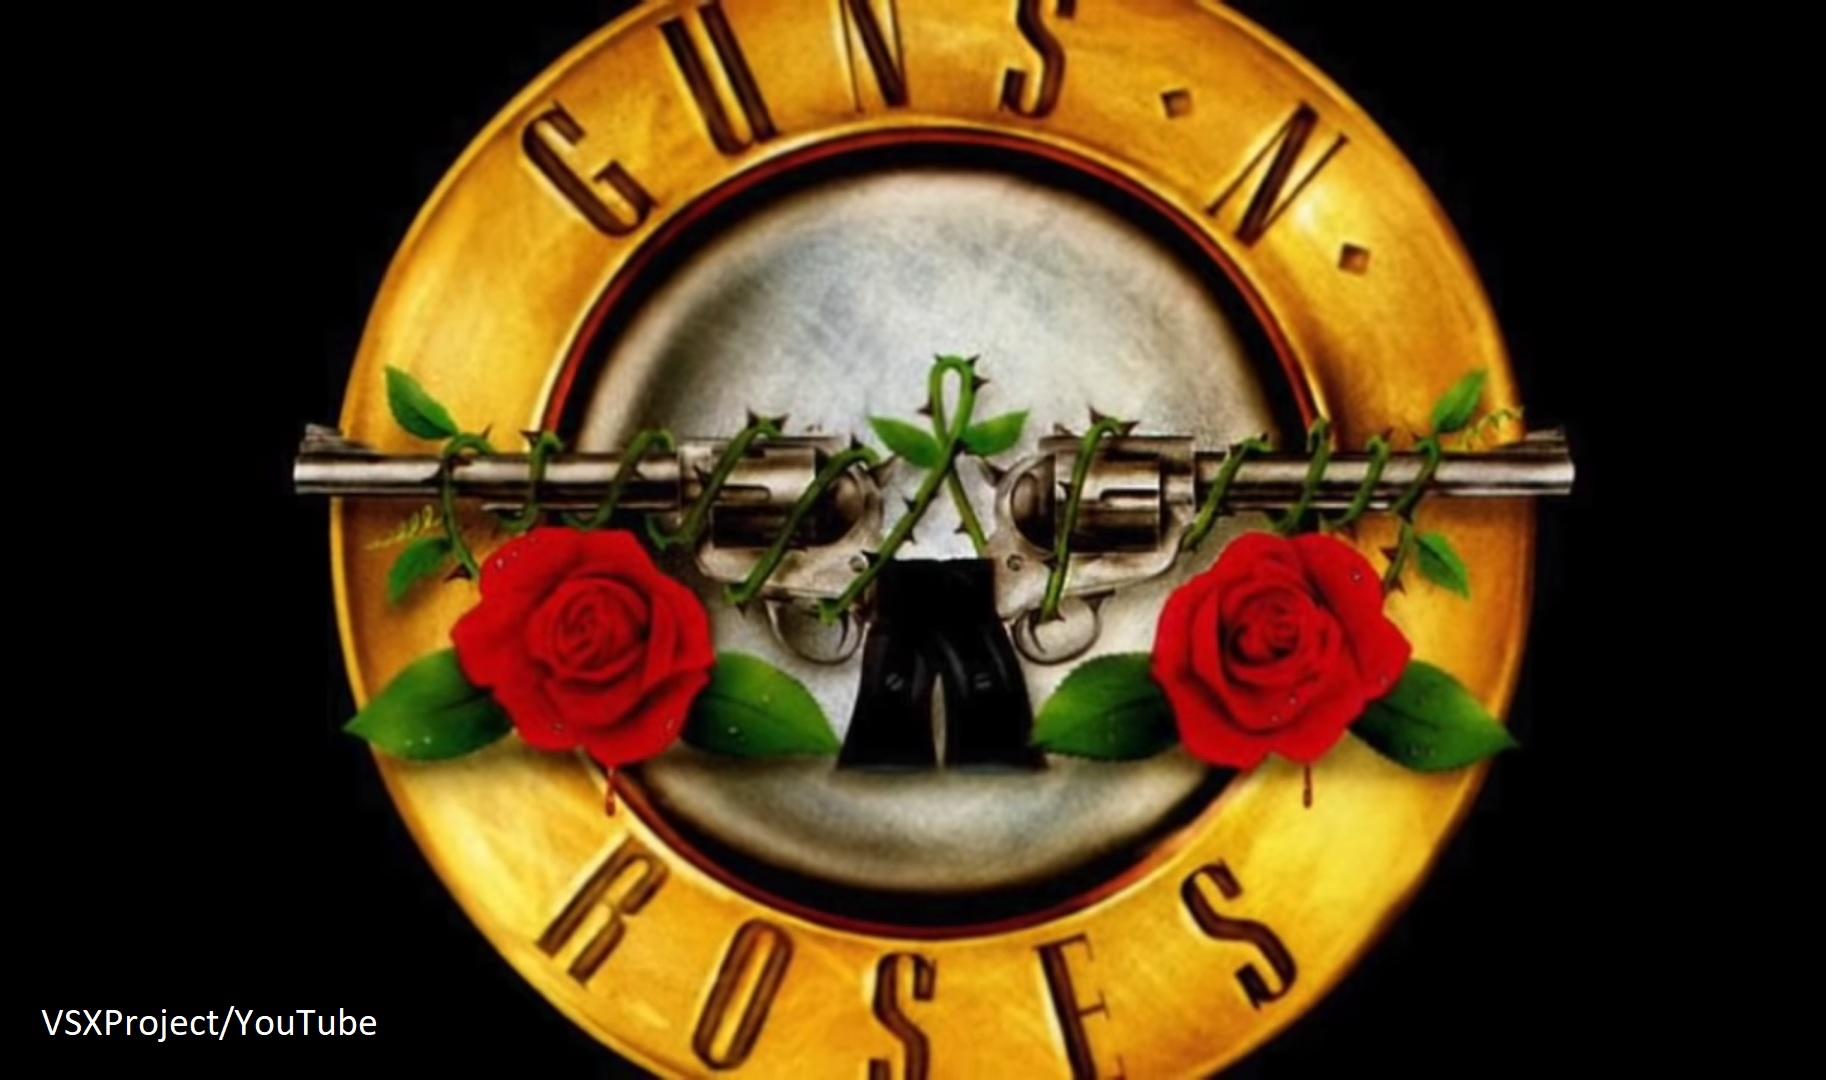 Guns N' Roses' Not In This Lifetime tour